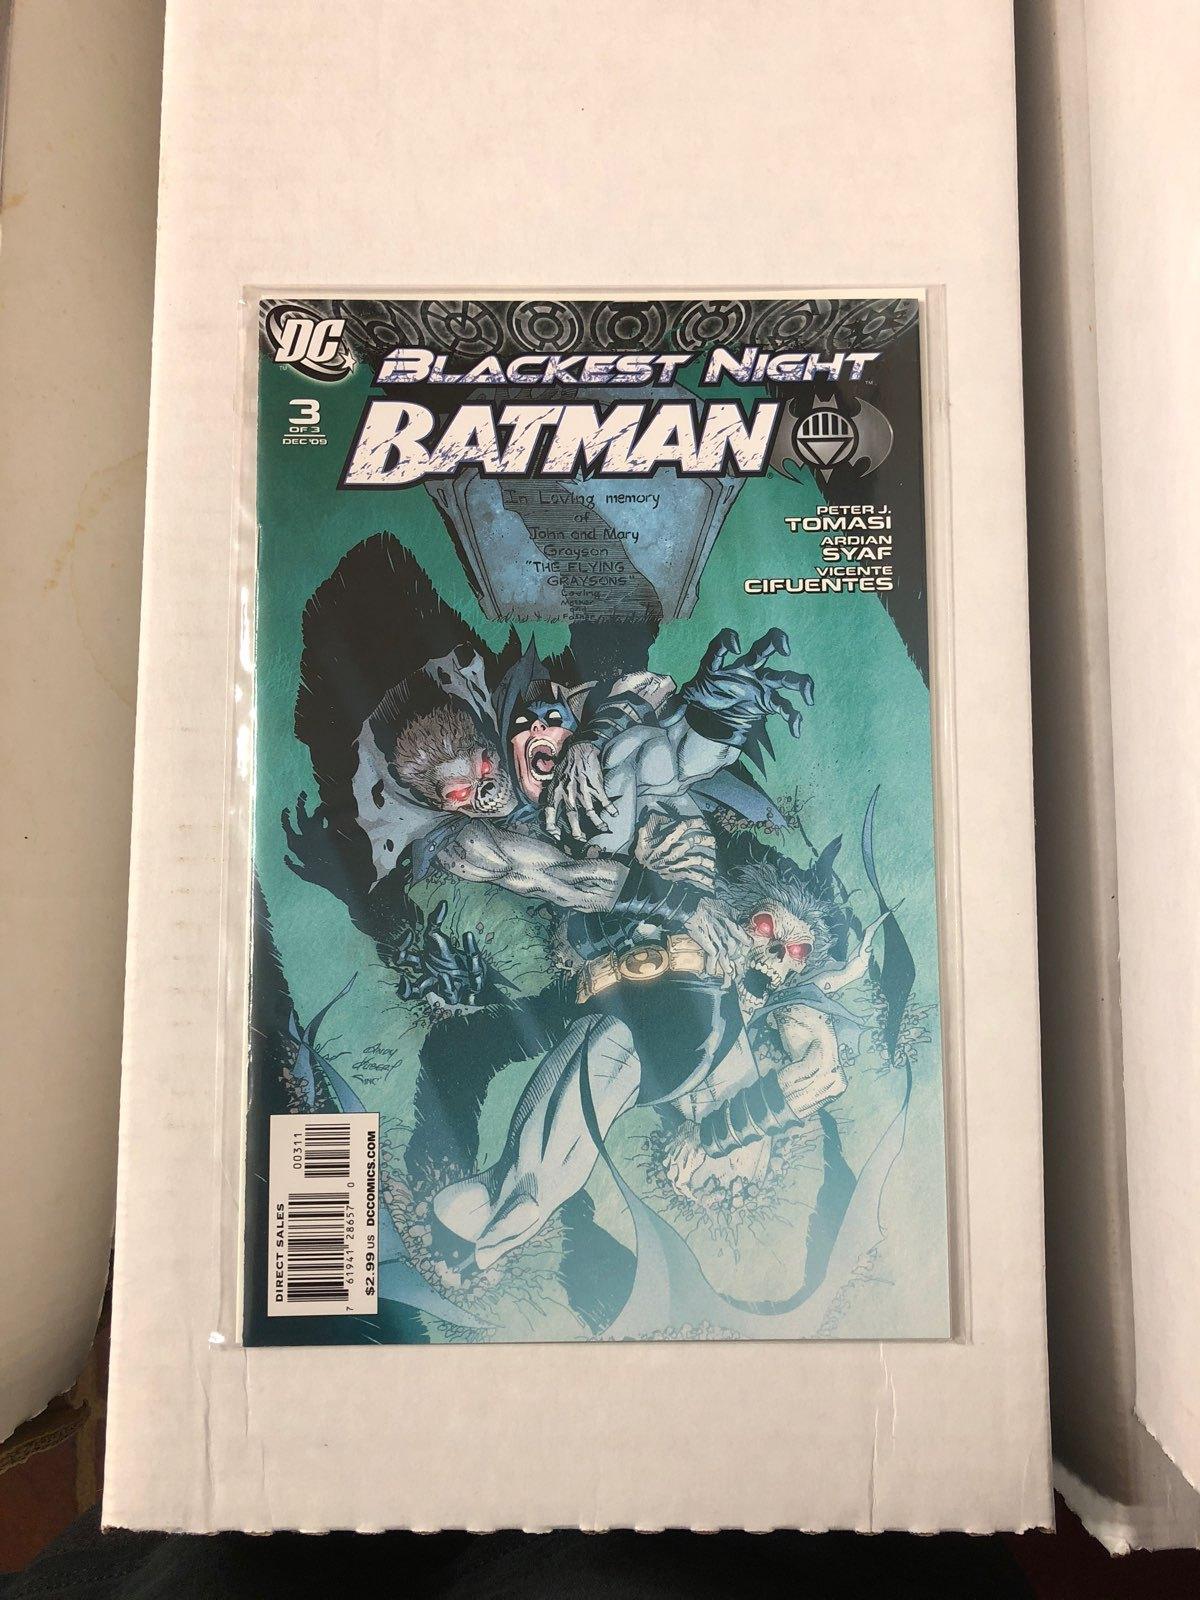 Blackest Night Batman #3